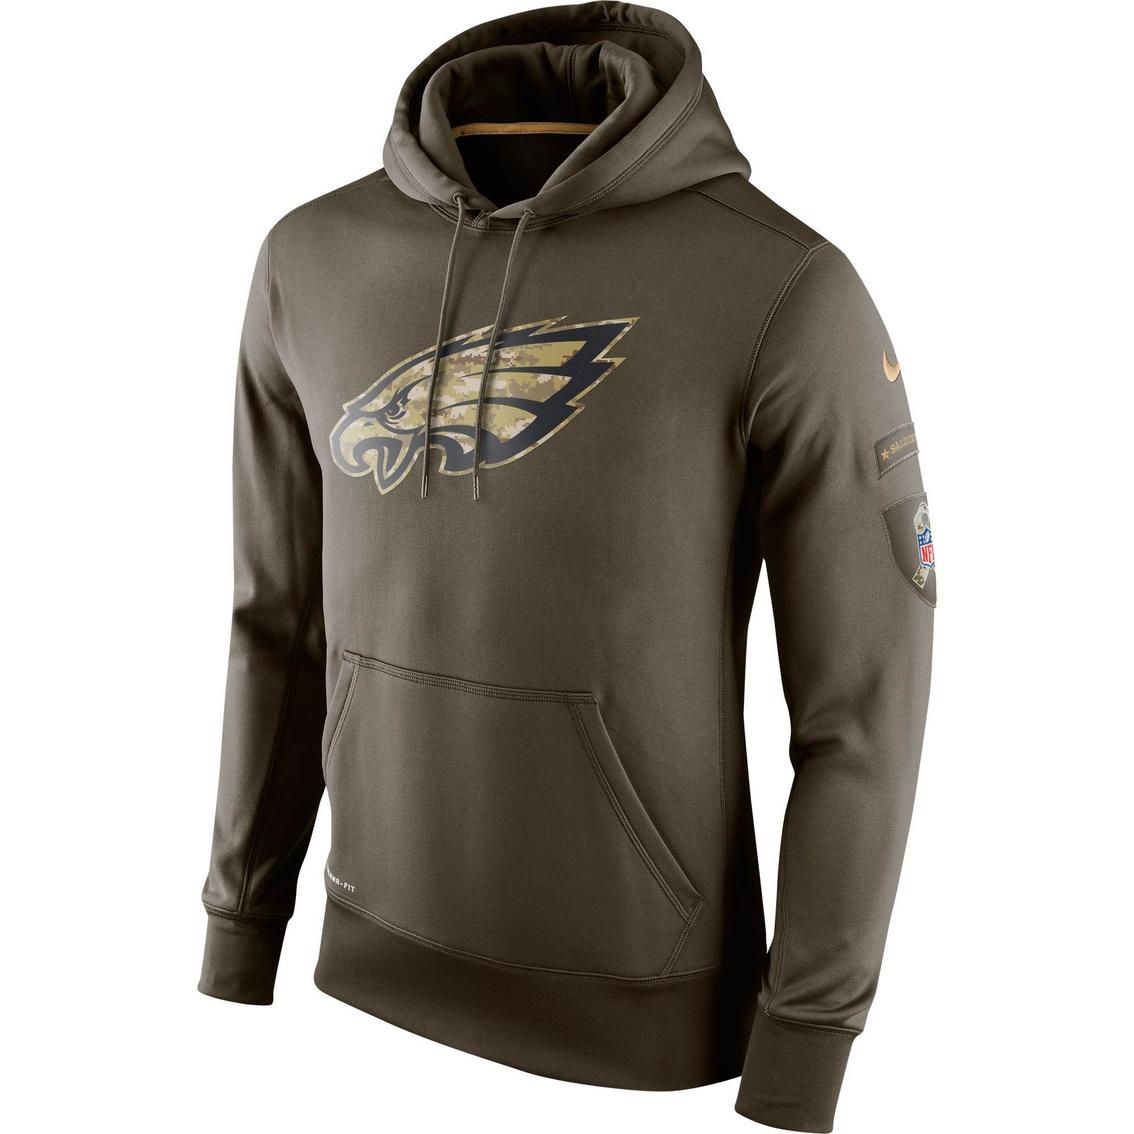 sale retailer a1cf2 00023 Nike Nfl Philadelphia Eagles Salute To Service Ko Hoodie ...